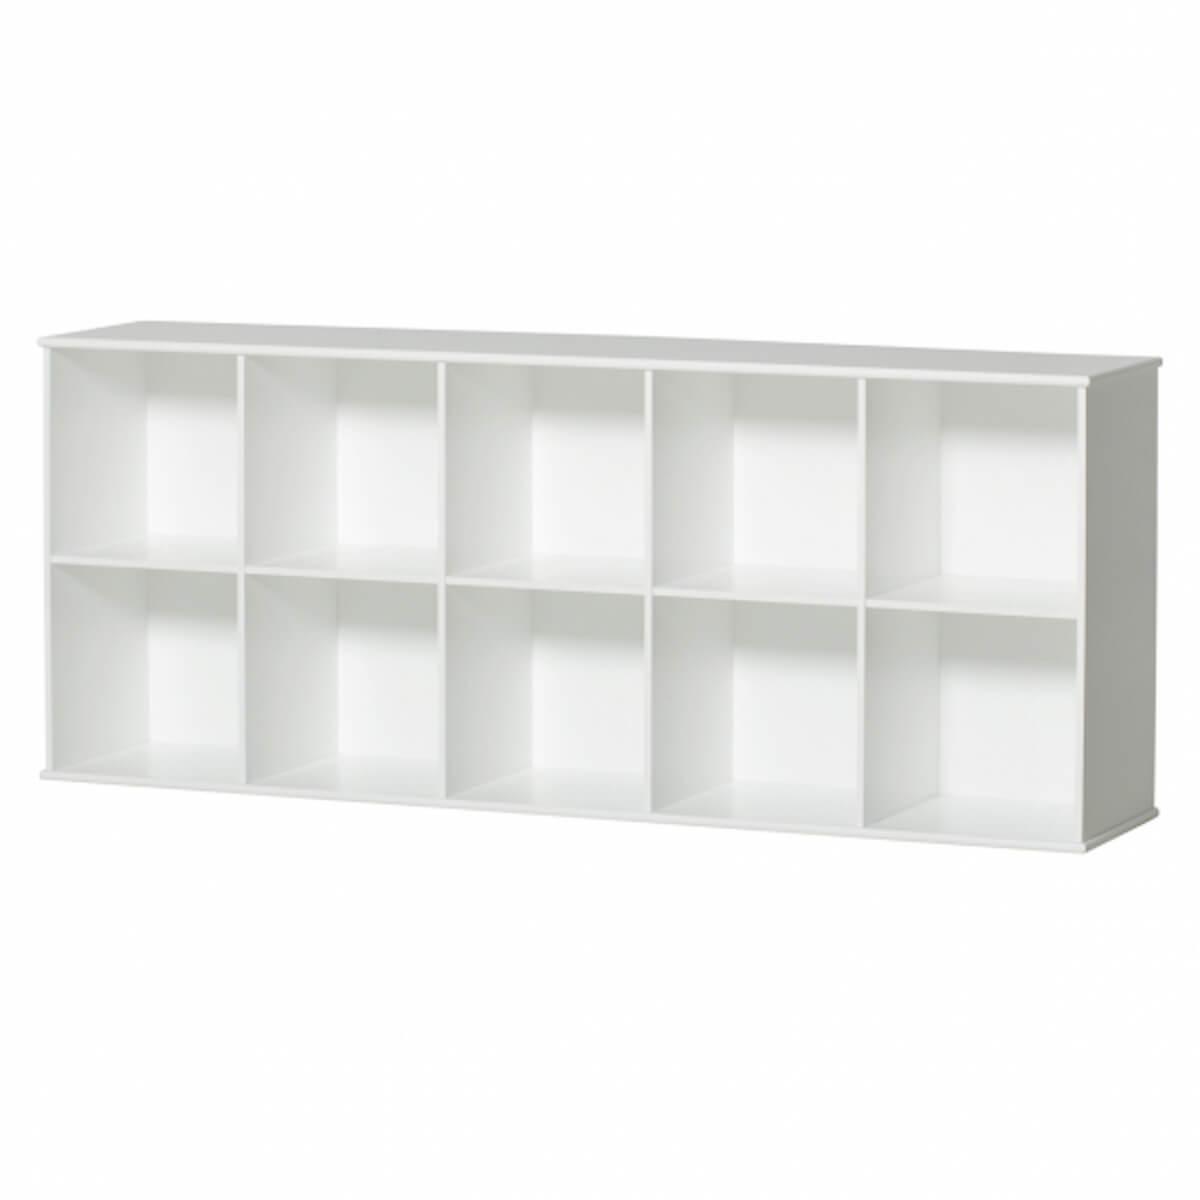 Möbel-Bank 174x78cm WOOD Oliver Furniture weiß